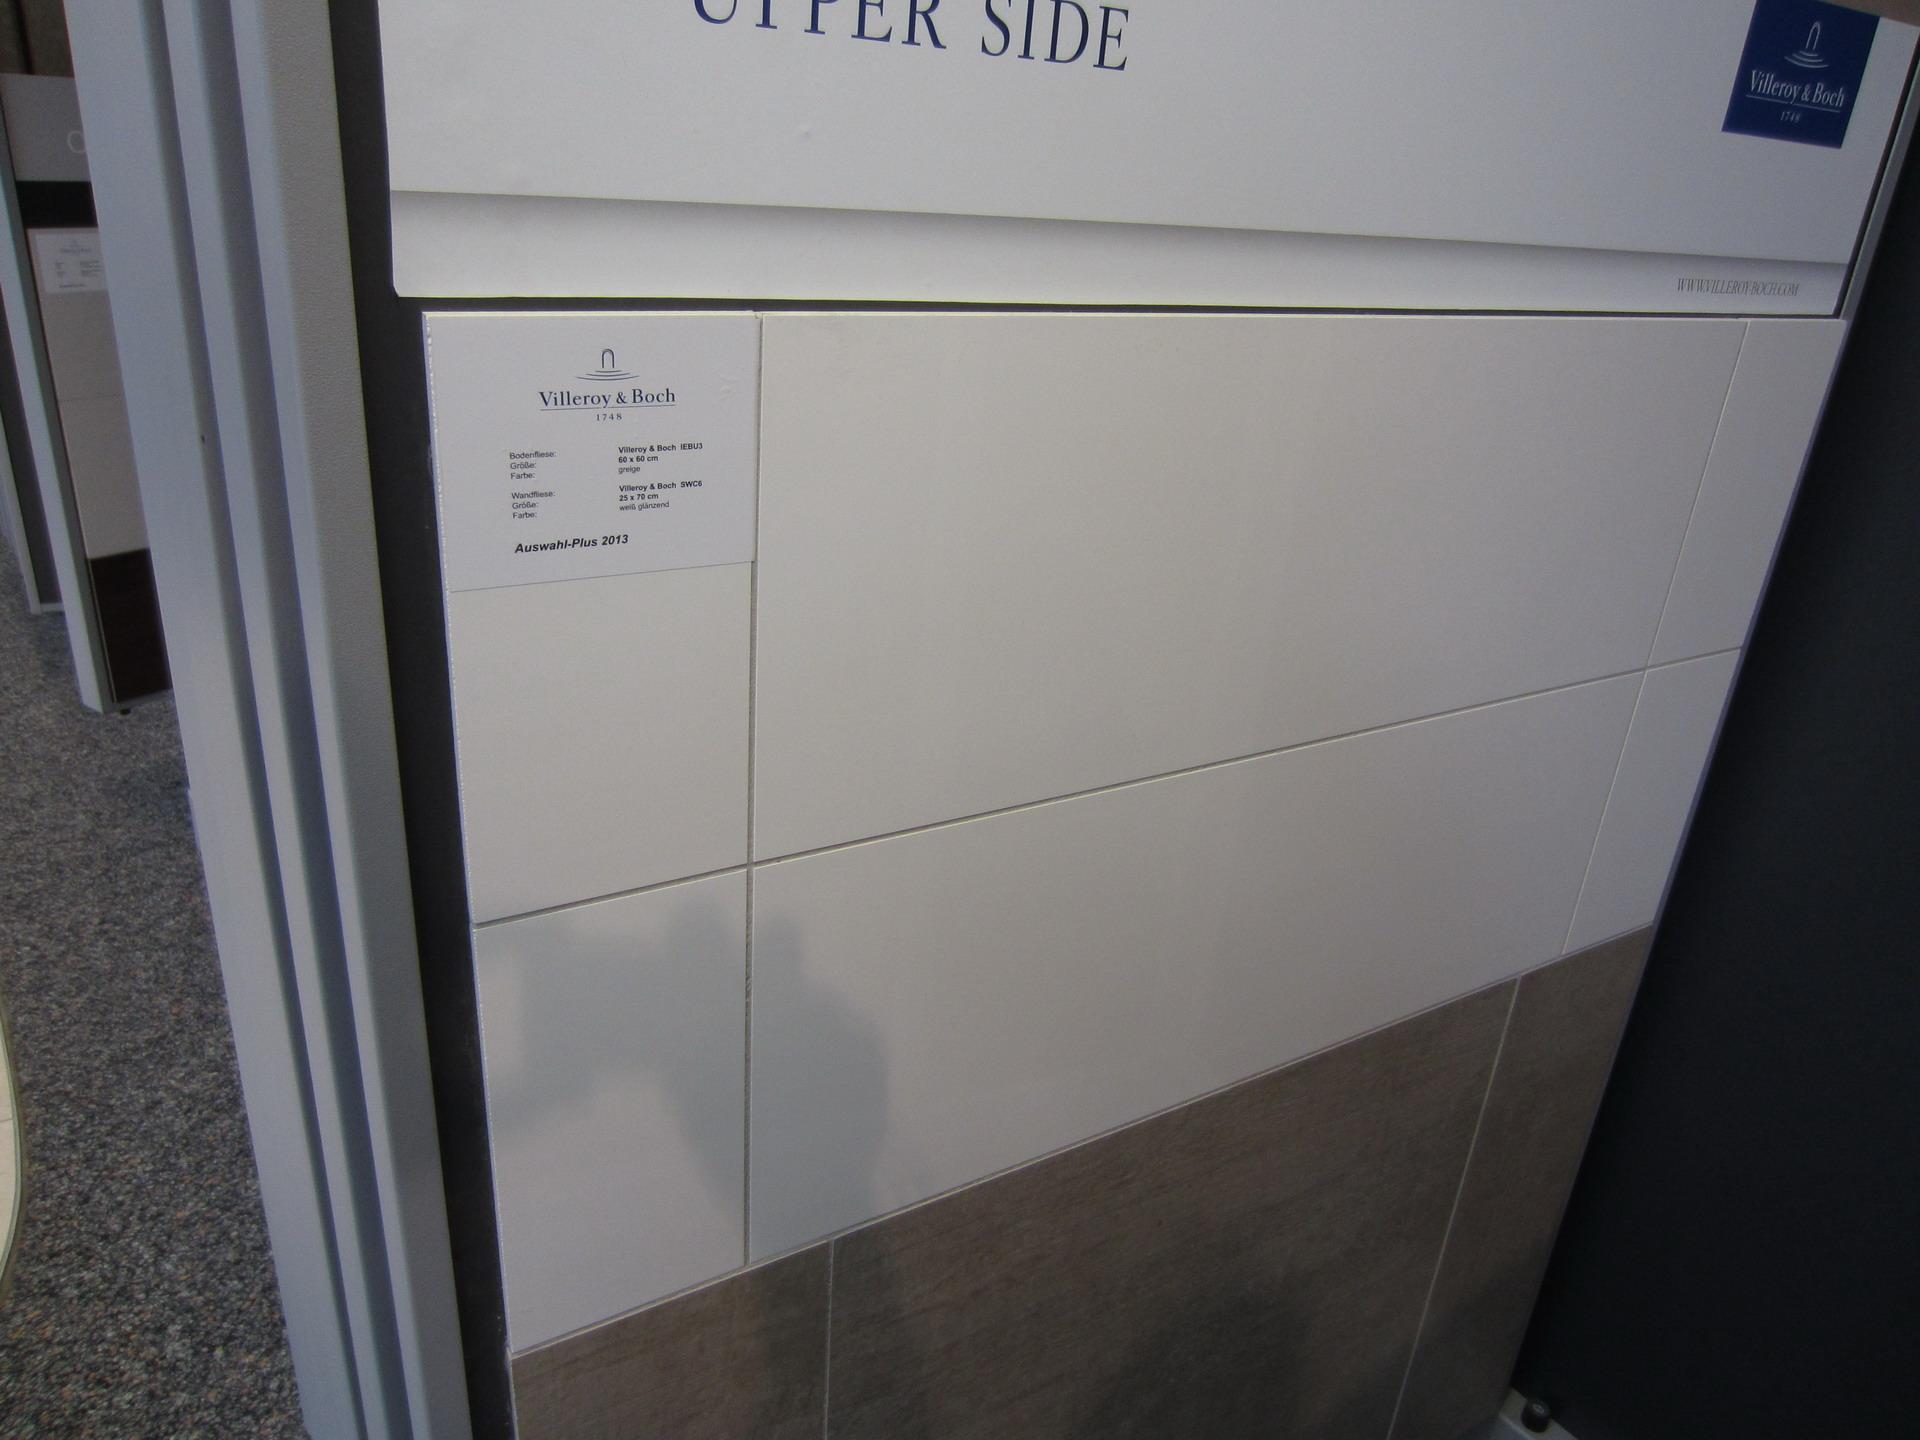 bemustert wir bauen 39 am lusthaus 39. Black Bedroom Furniture Sets. Home Design Ideas